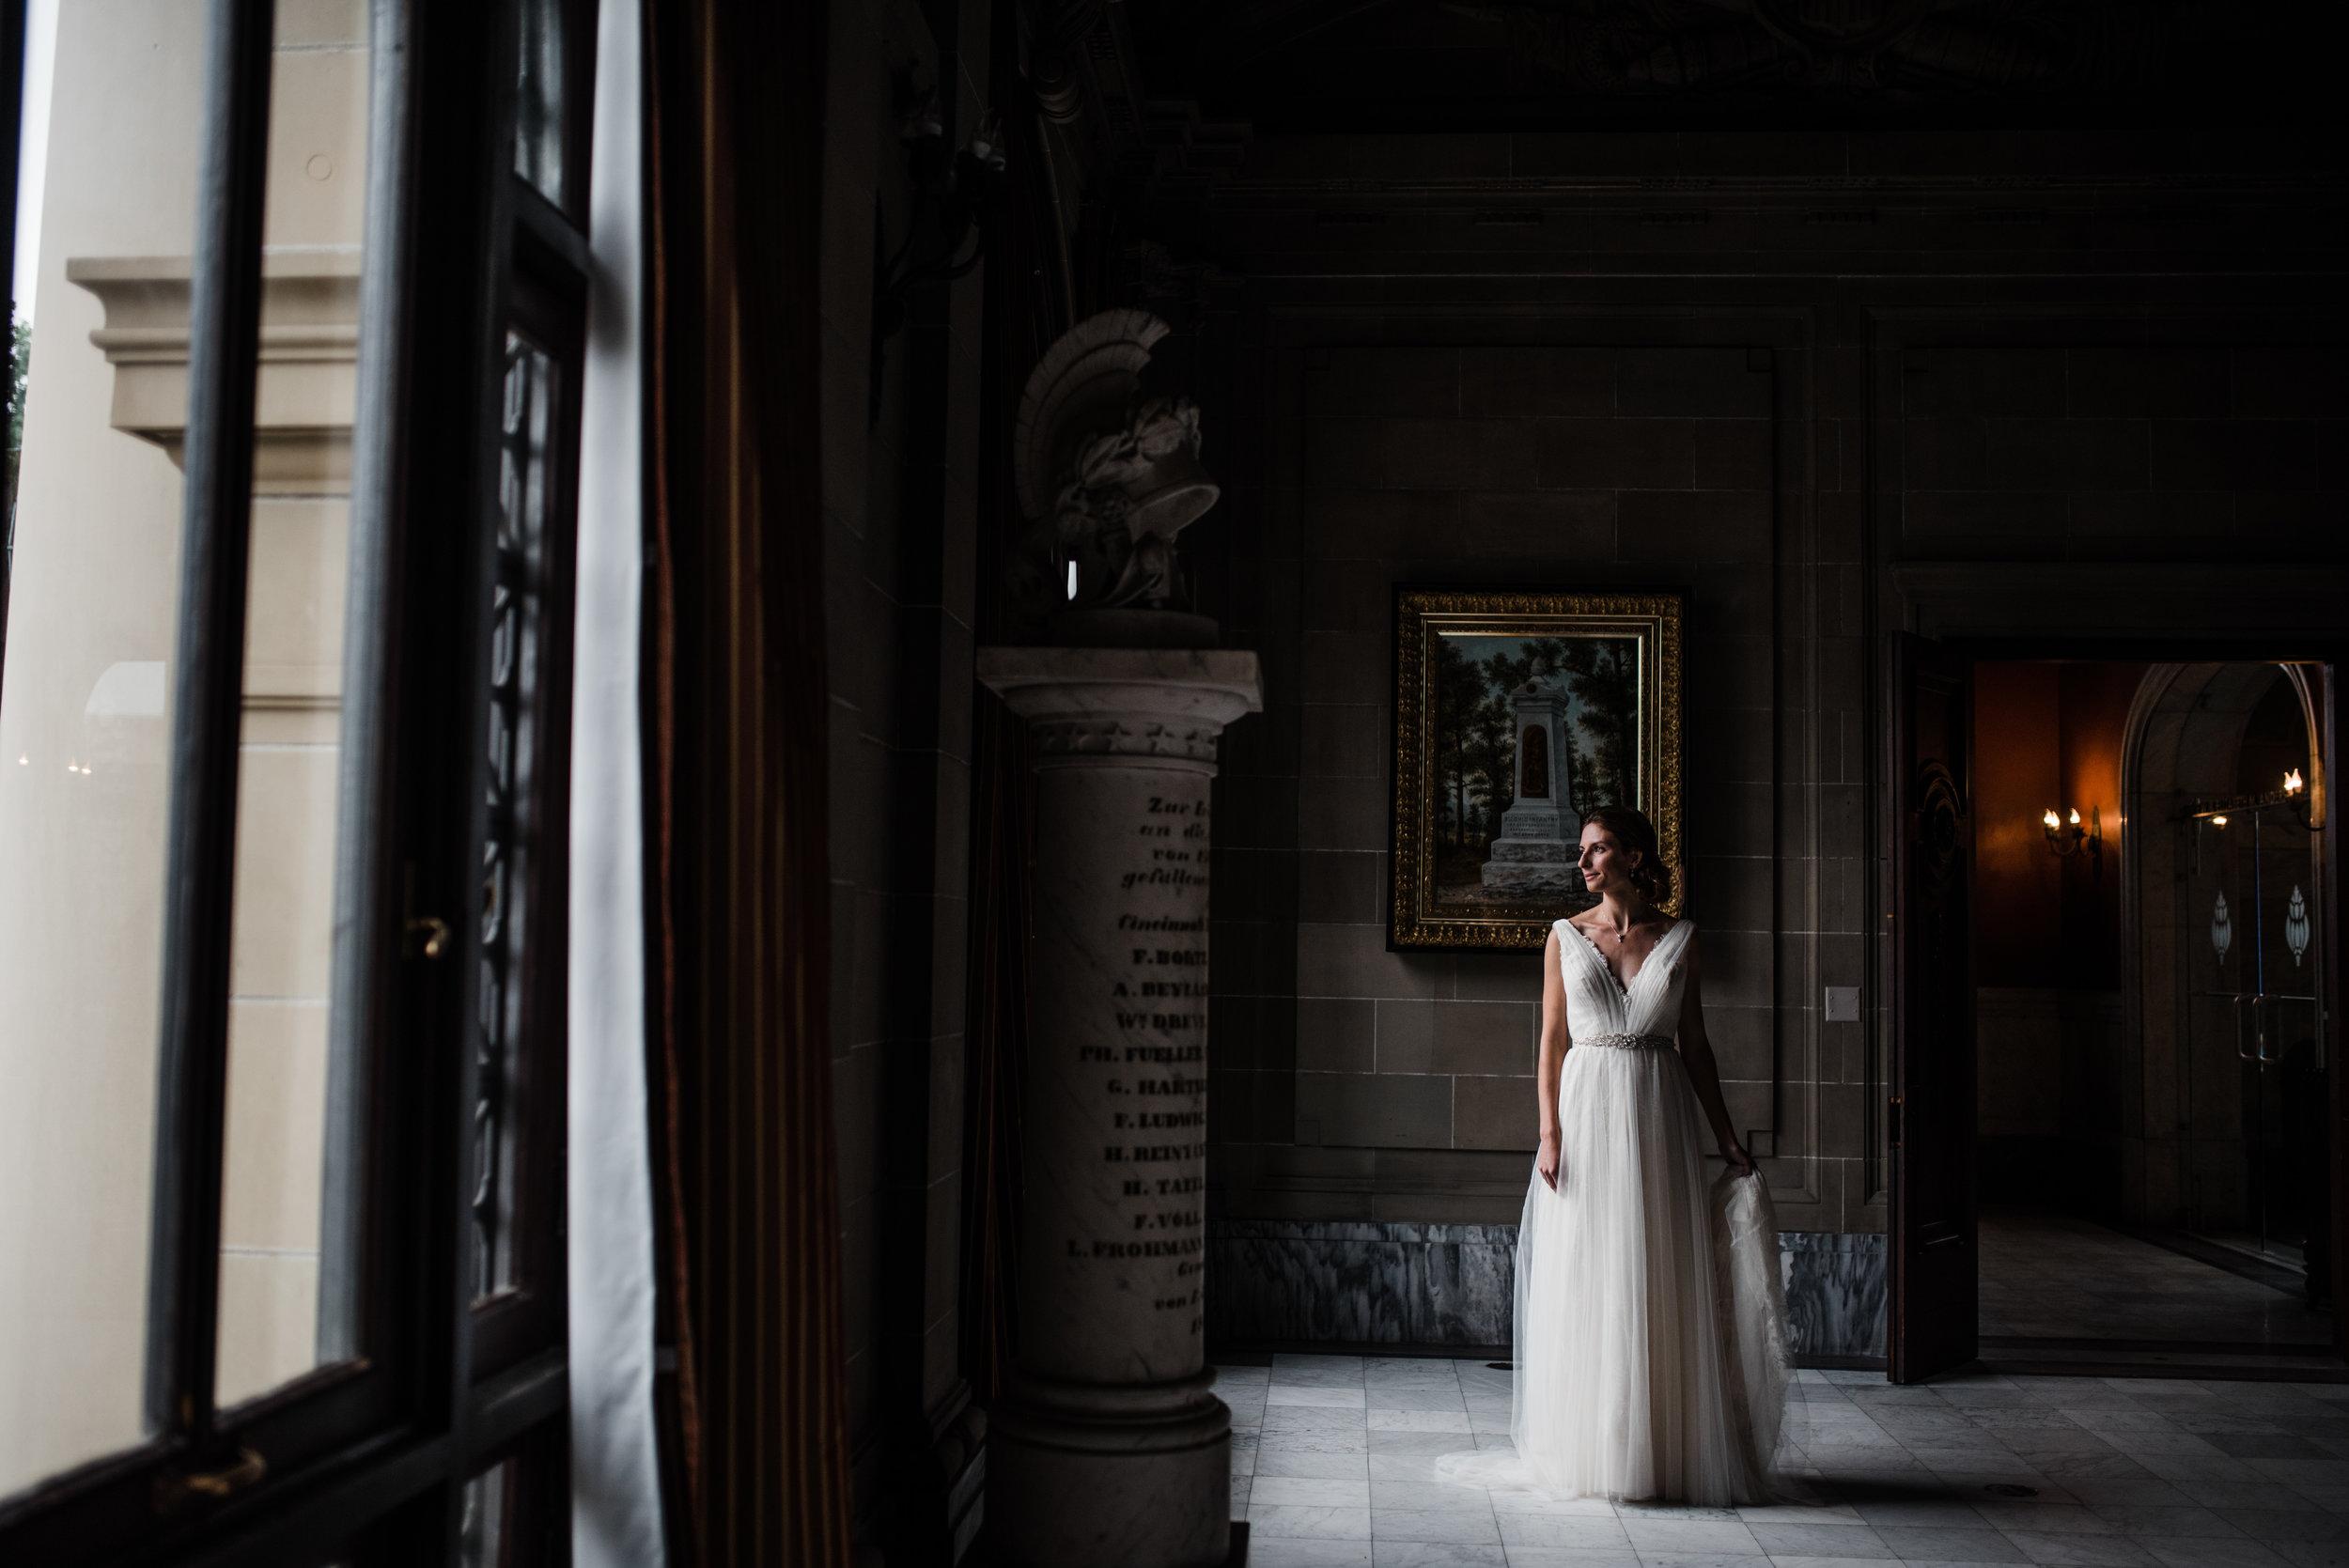 cincinnati-wedding-photographer-chelsea-hall-photography-memorial-hall-7.jpg